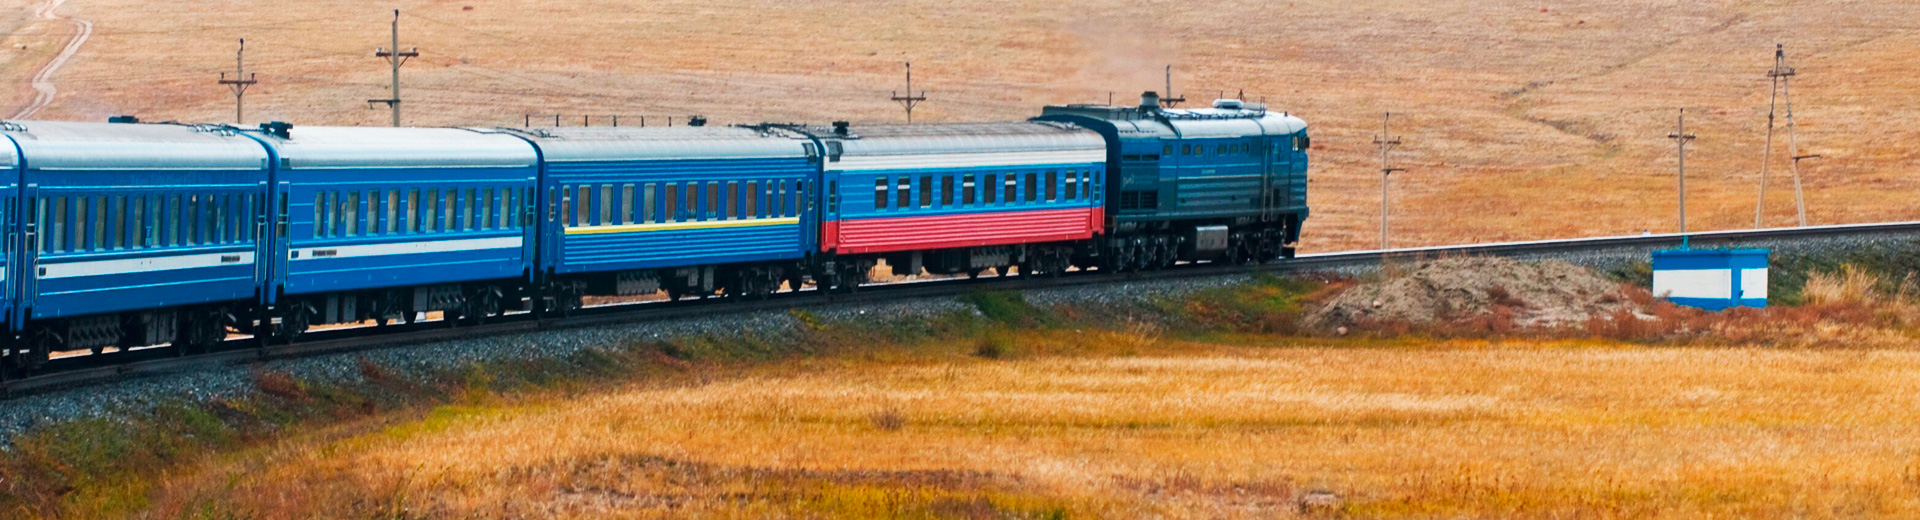 Transkaukasus - Erlebnisreise im Zug